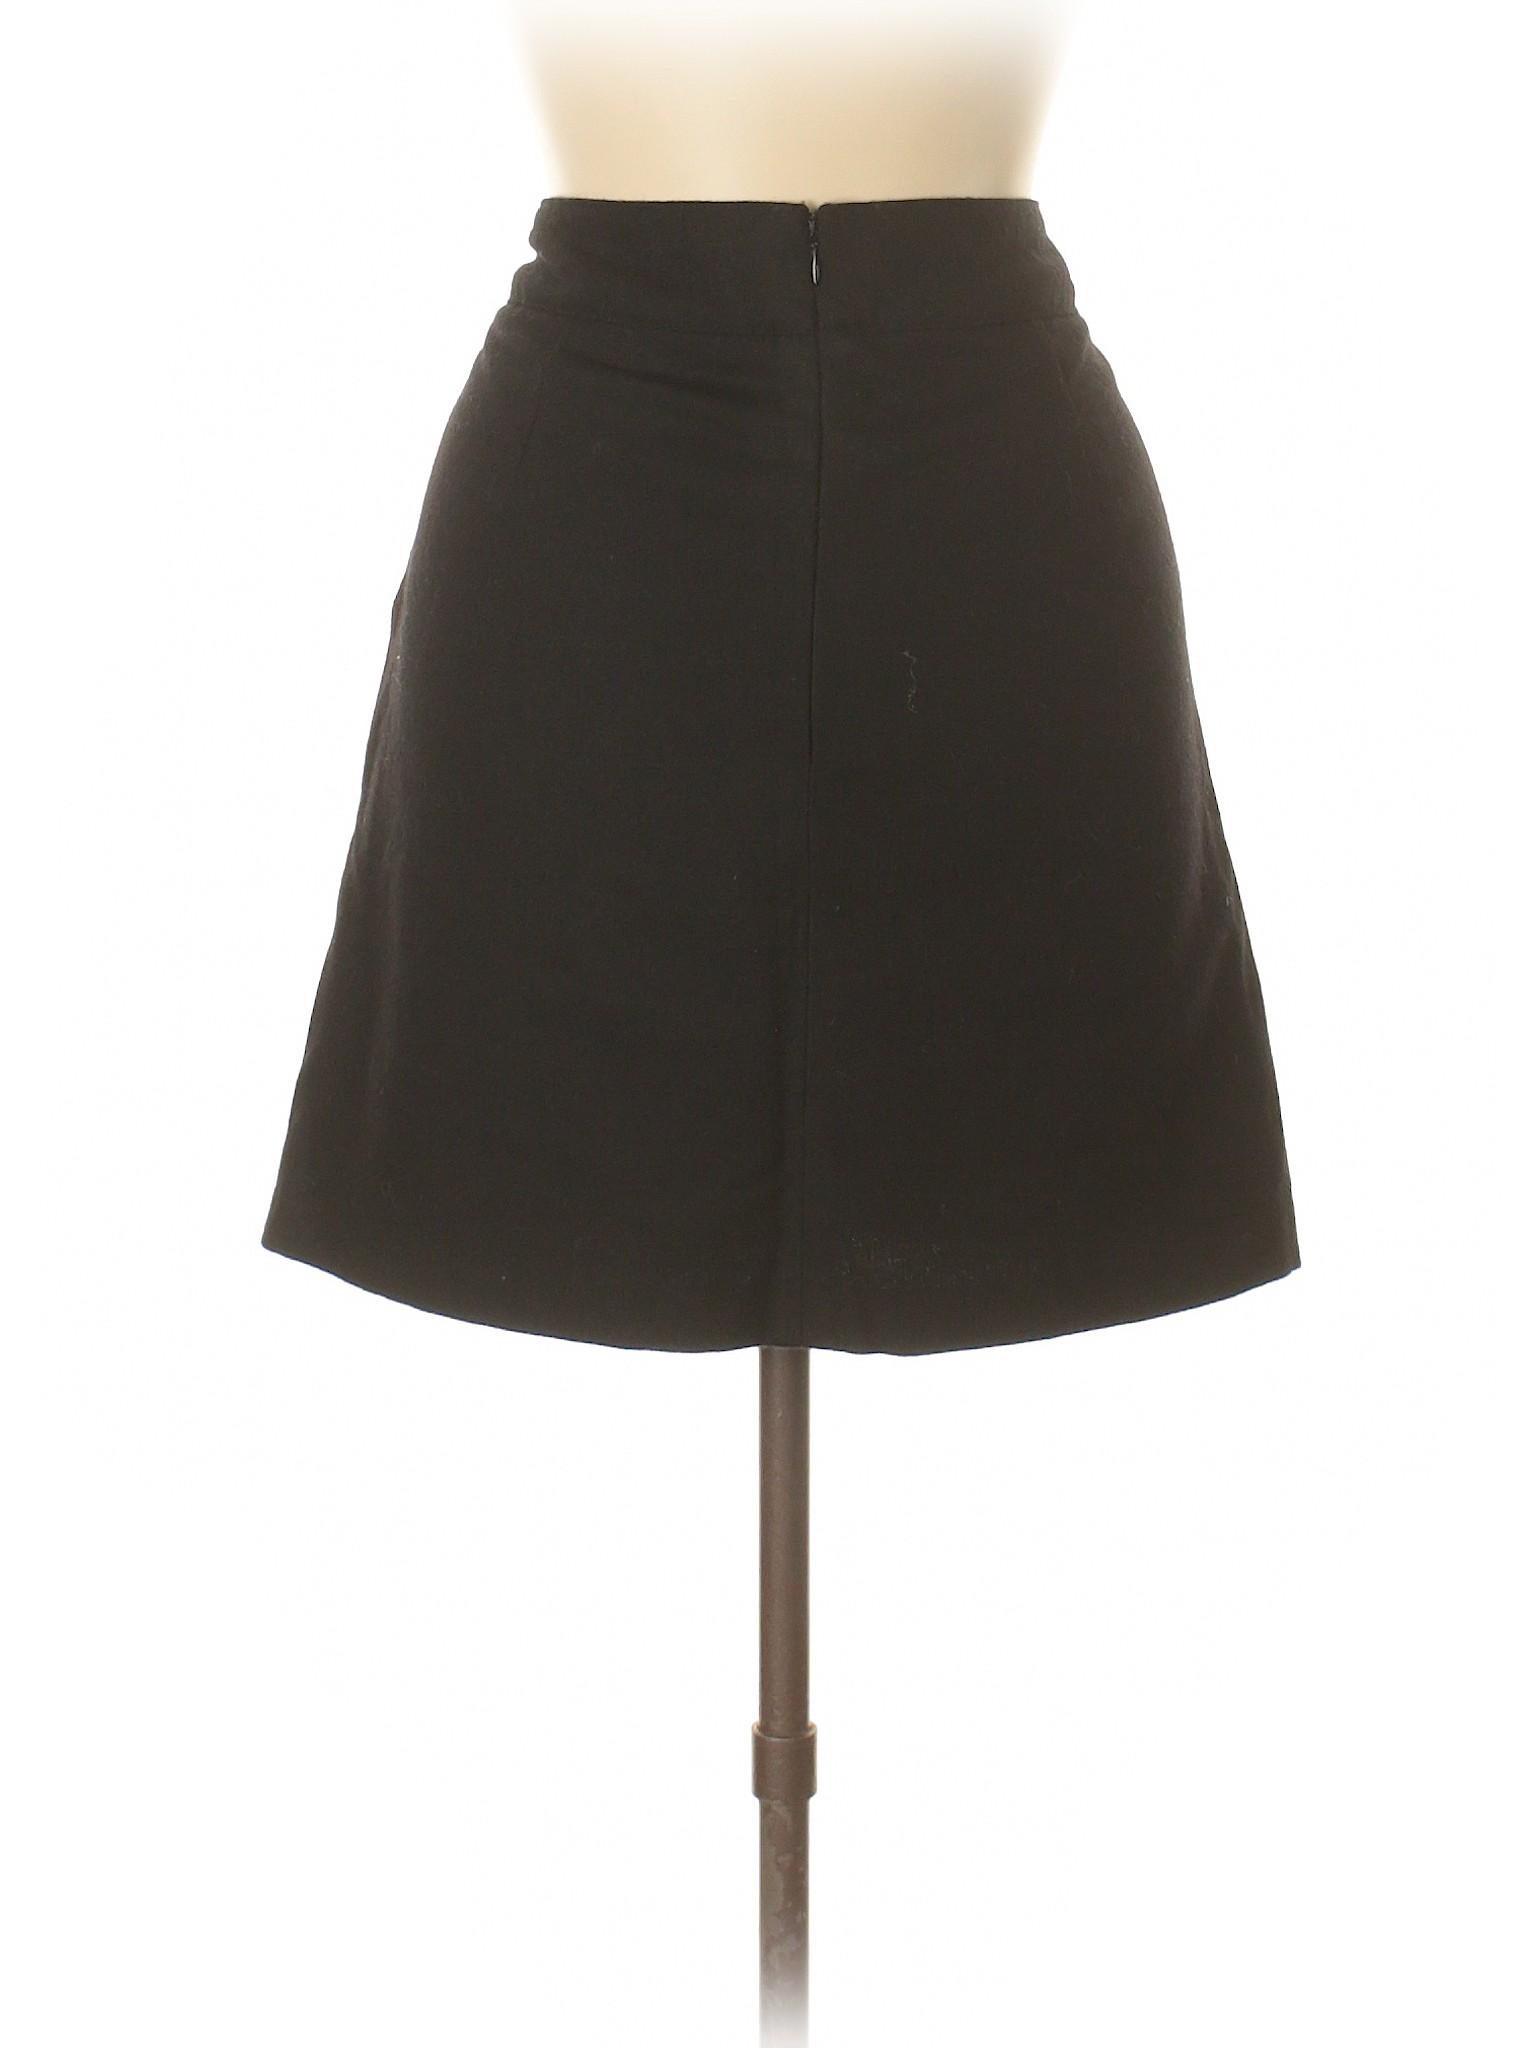 Wool Skirt Boutique Wool Boutique Wool Boutique Skirt Skirt Rnqa8wO